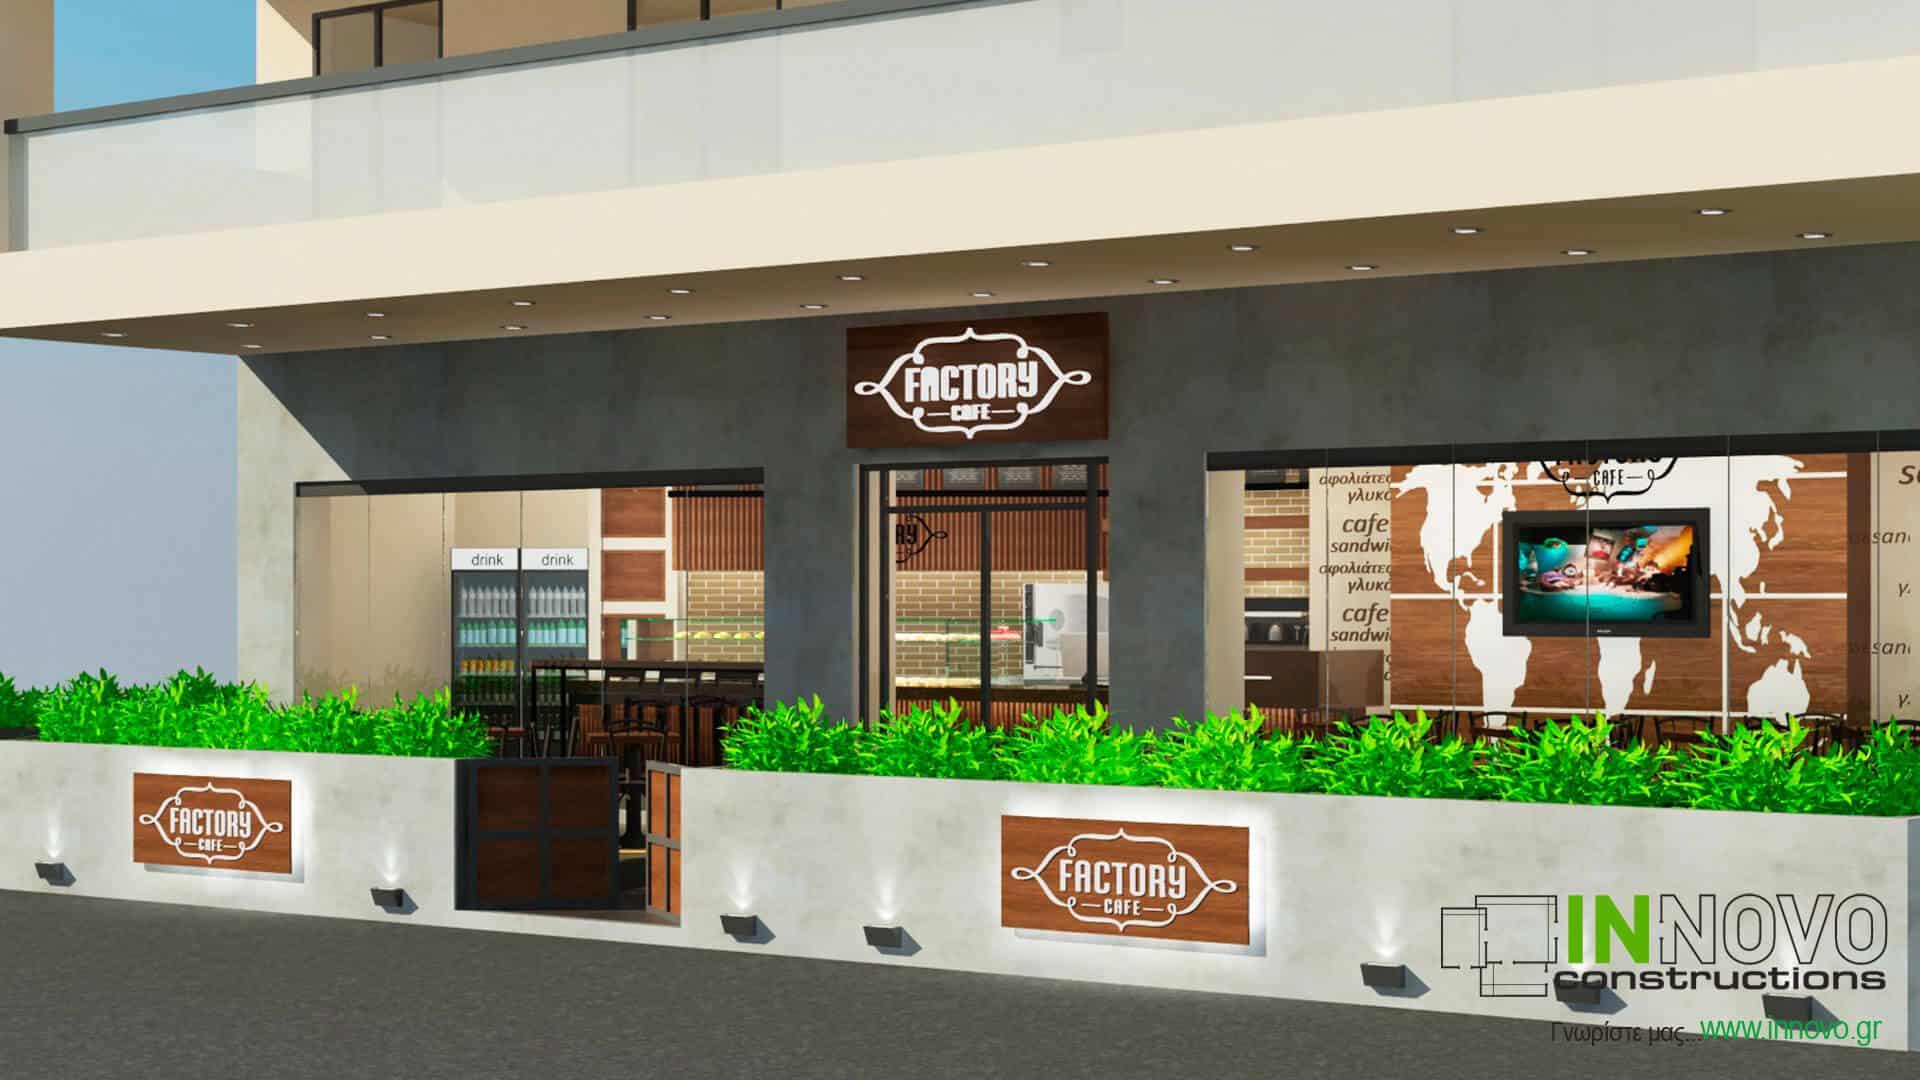 kataskevi-snack-cafe-construction-snack-gerakas-1842-13